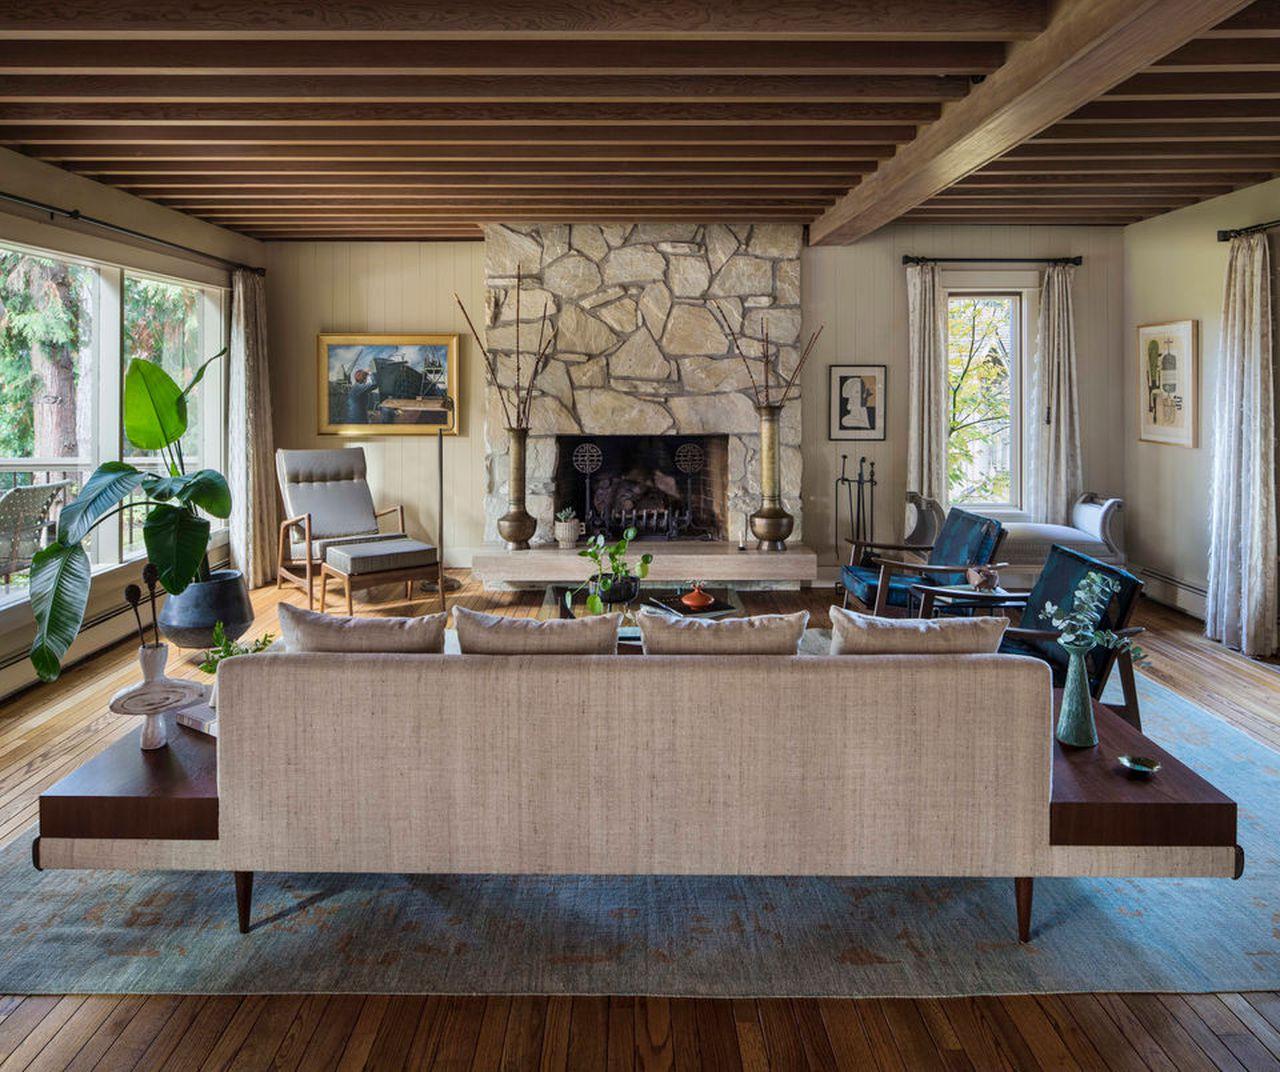 Remodeled midcentury modern returns to architect John Storrs' original vision